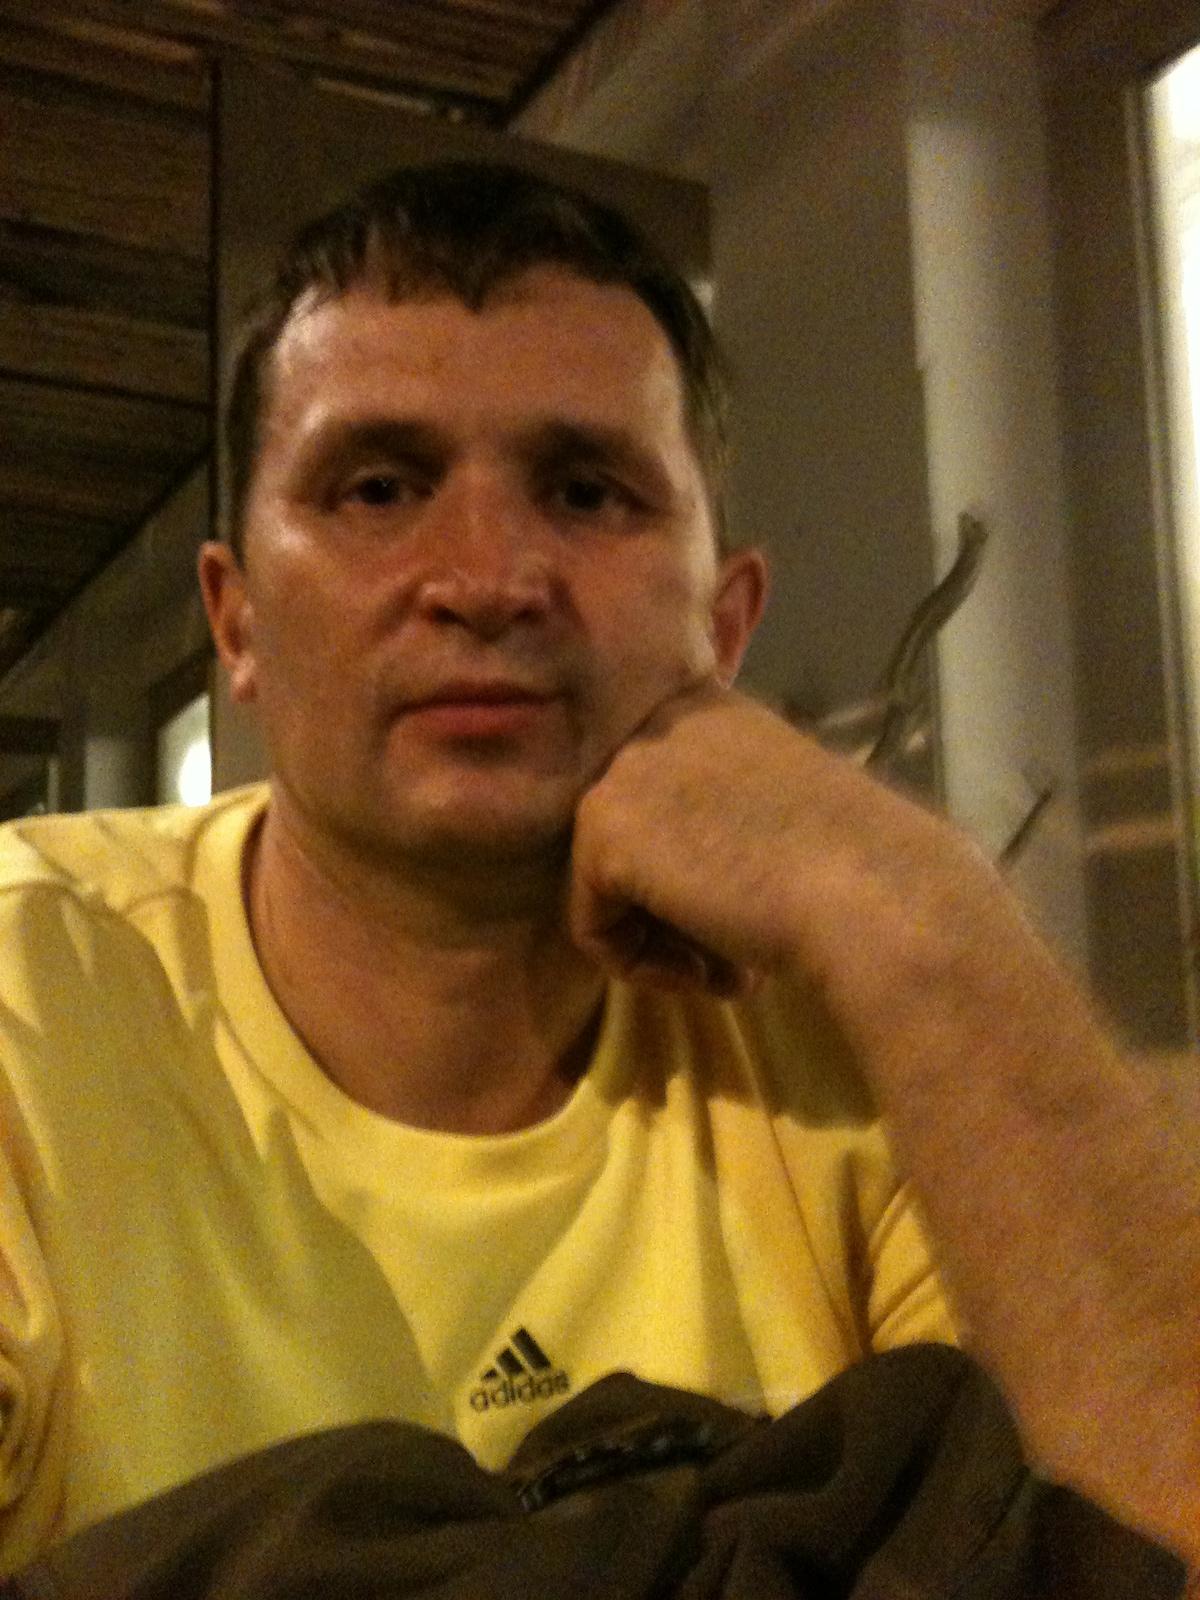 Дмитрий from Анапа